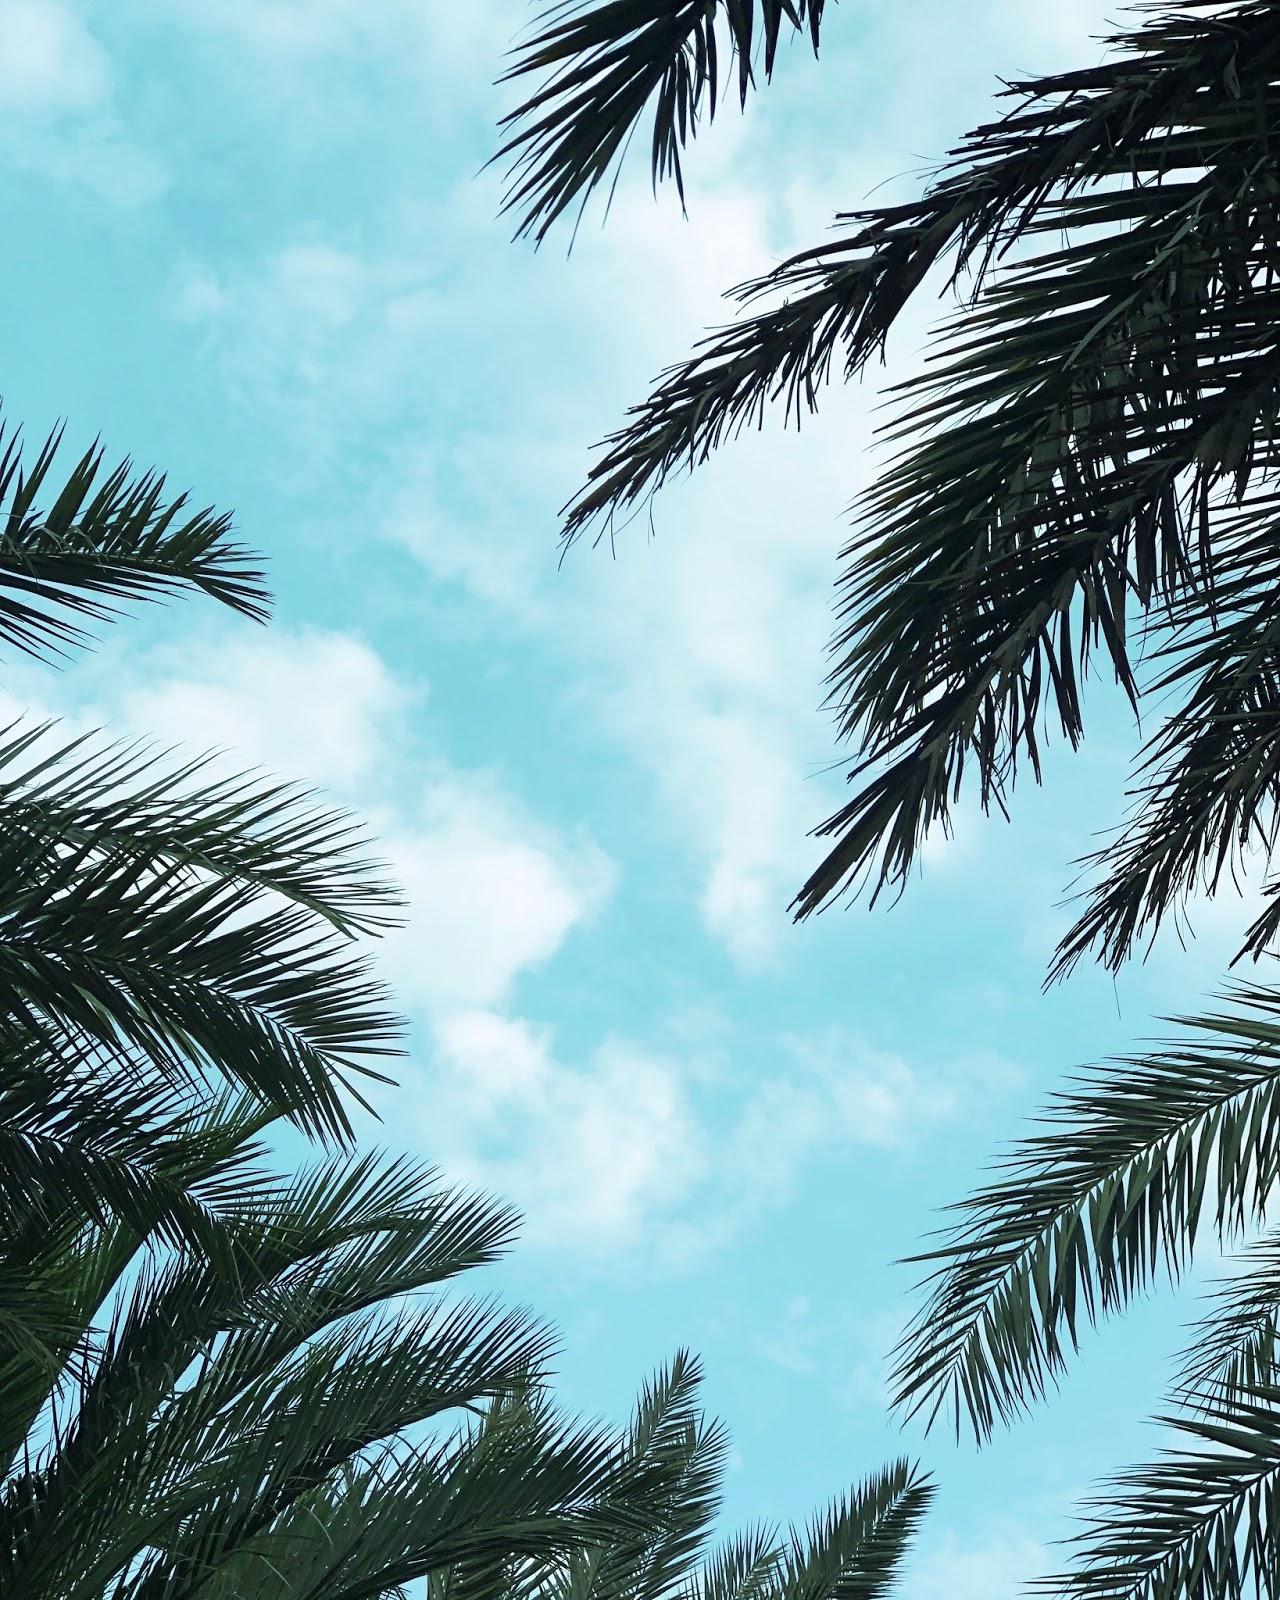 ourdubalilife.com Staycation Guide to Abu Dhabi